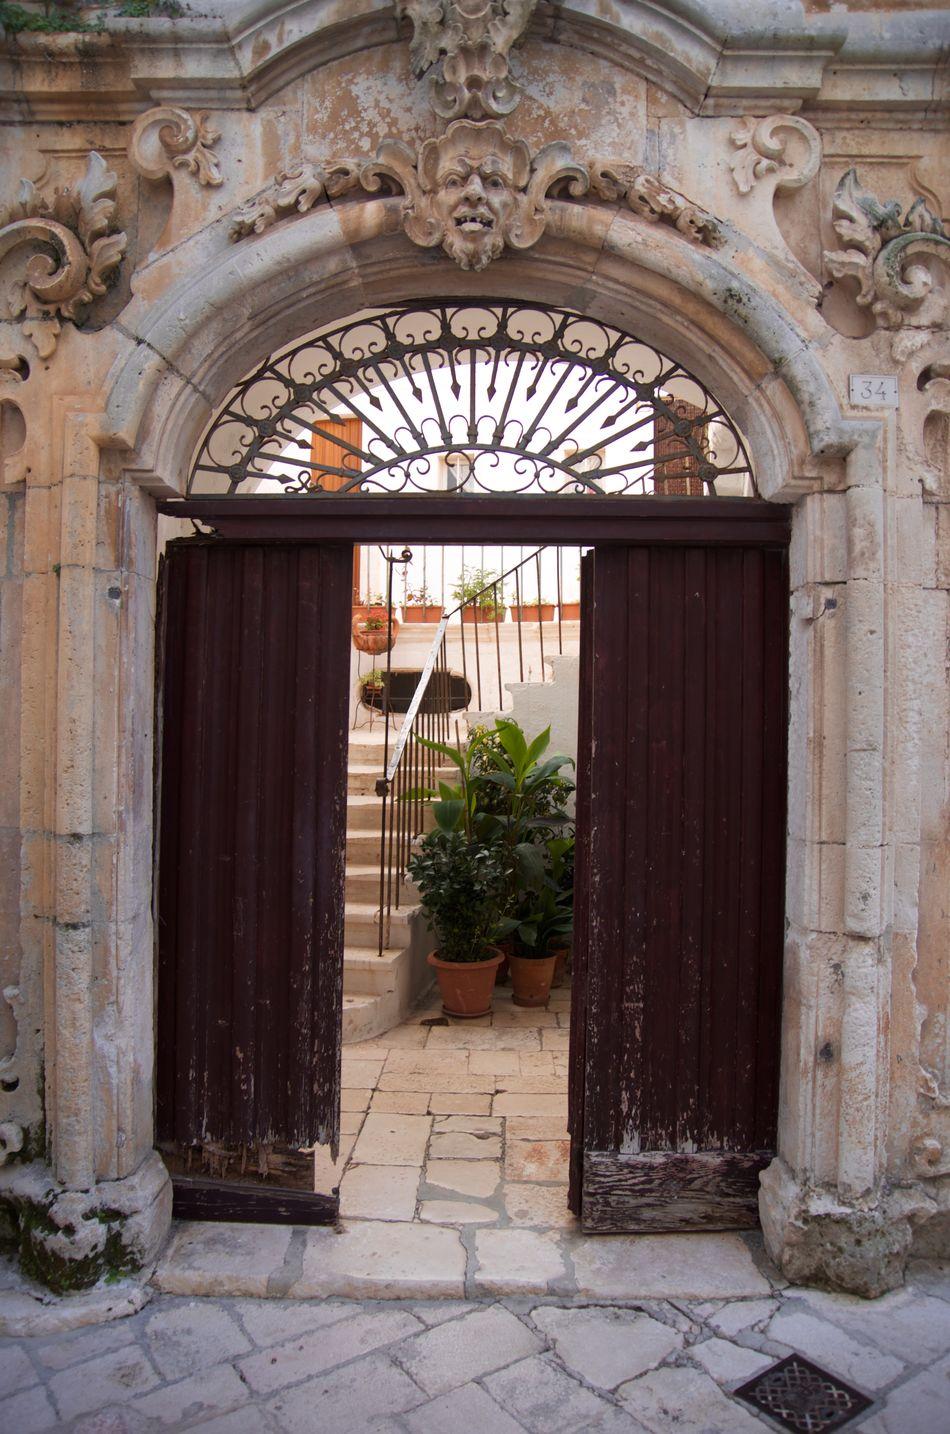 Arch Architecture Building Exterior Built Structure Door Entrance Italy Locorotondo Open Door